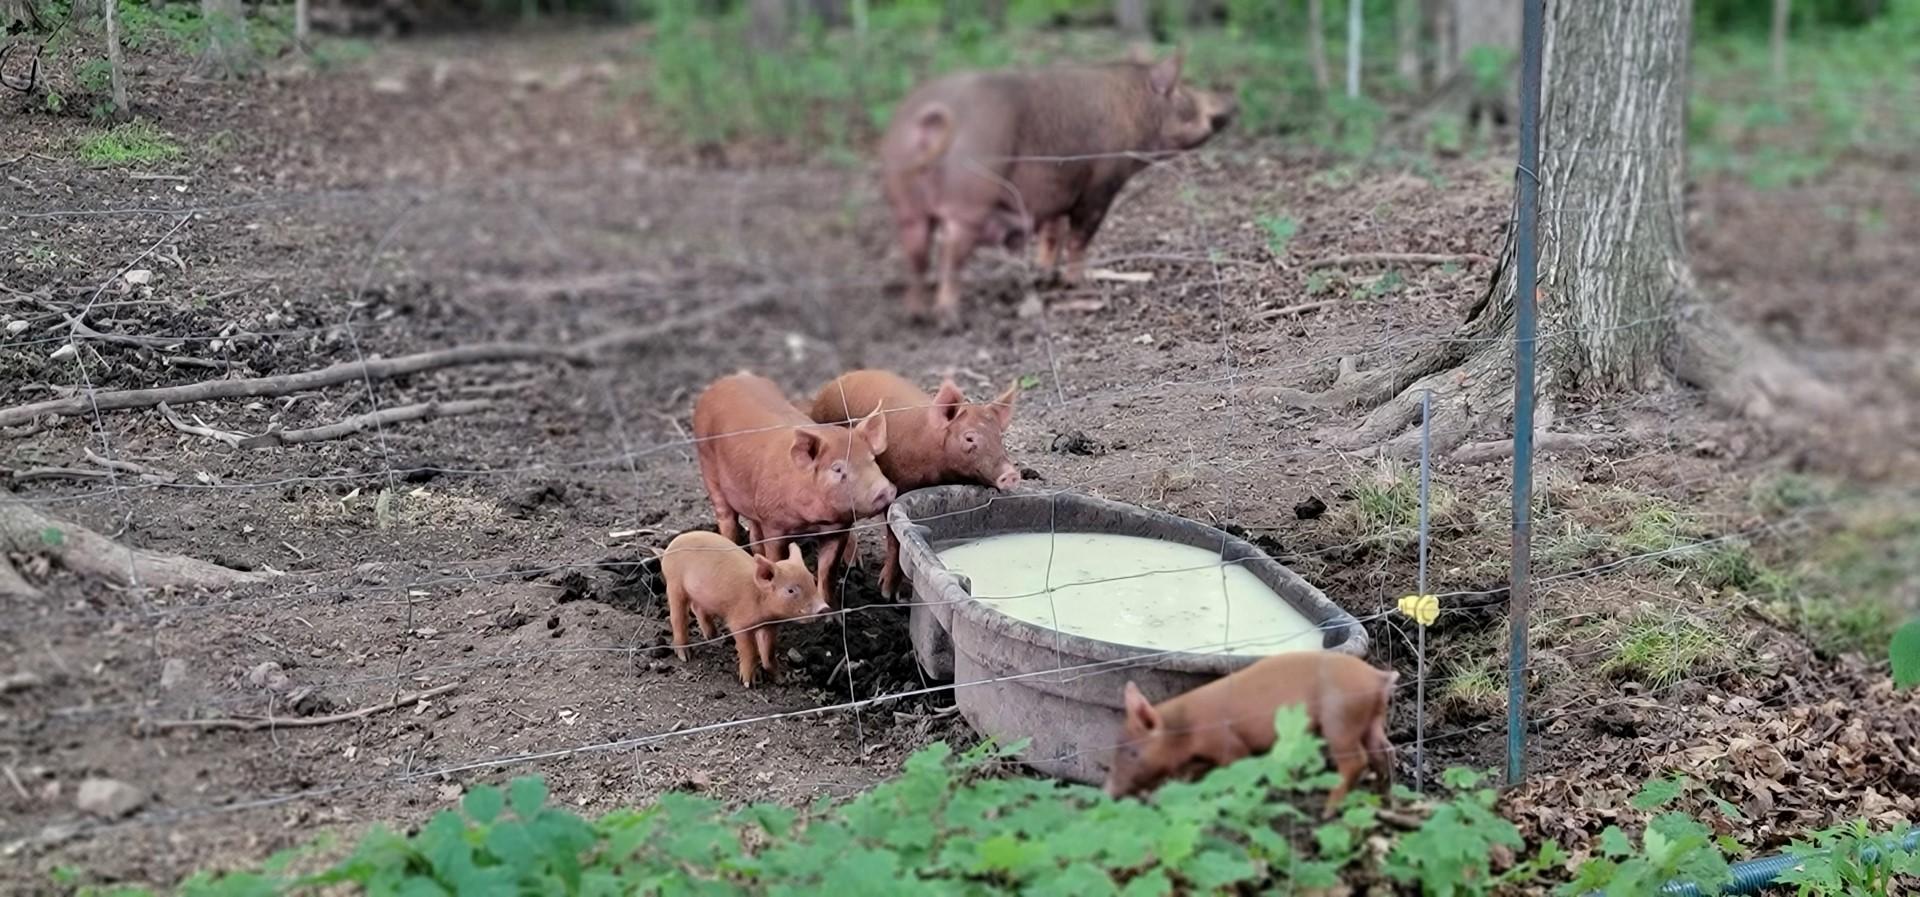 Baby pigs drinking whey milk